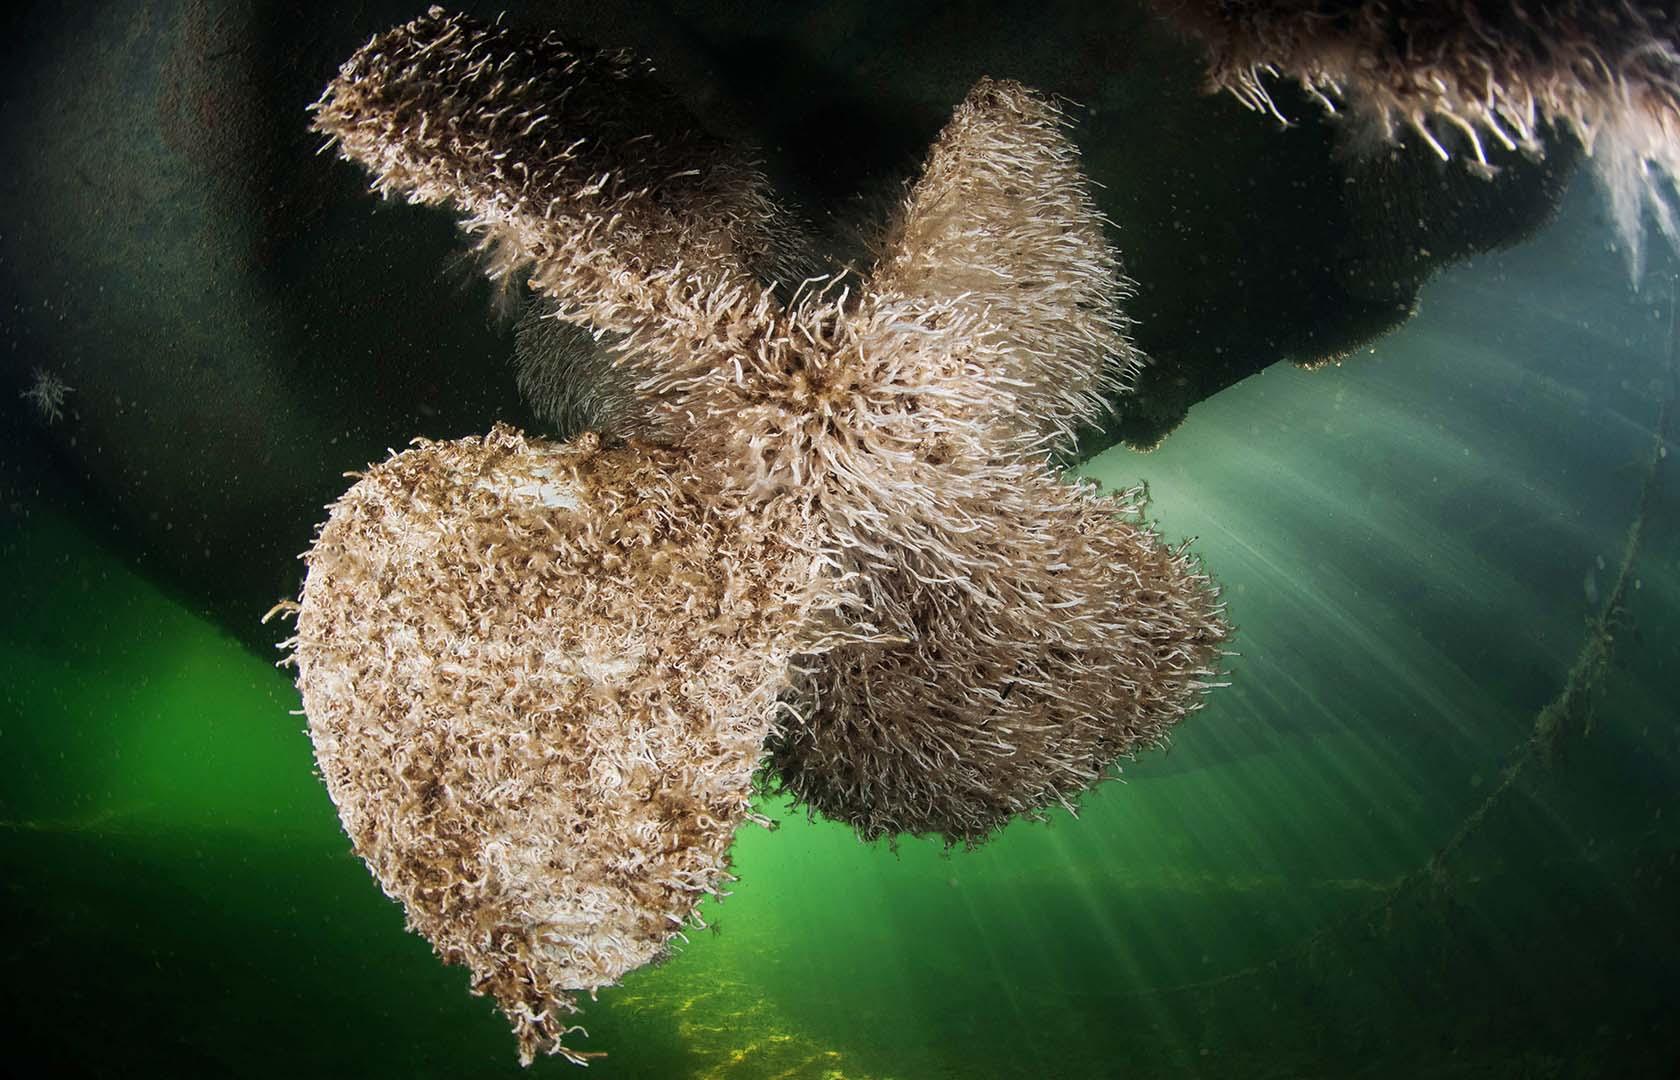 Hélice de un barco totalmente cubierta por este gusano.